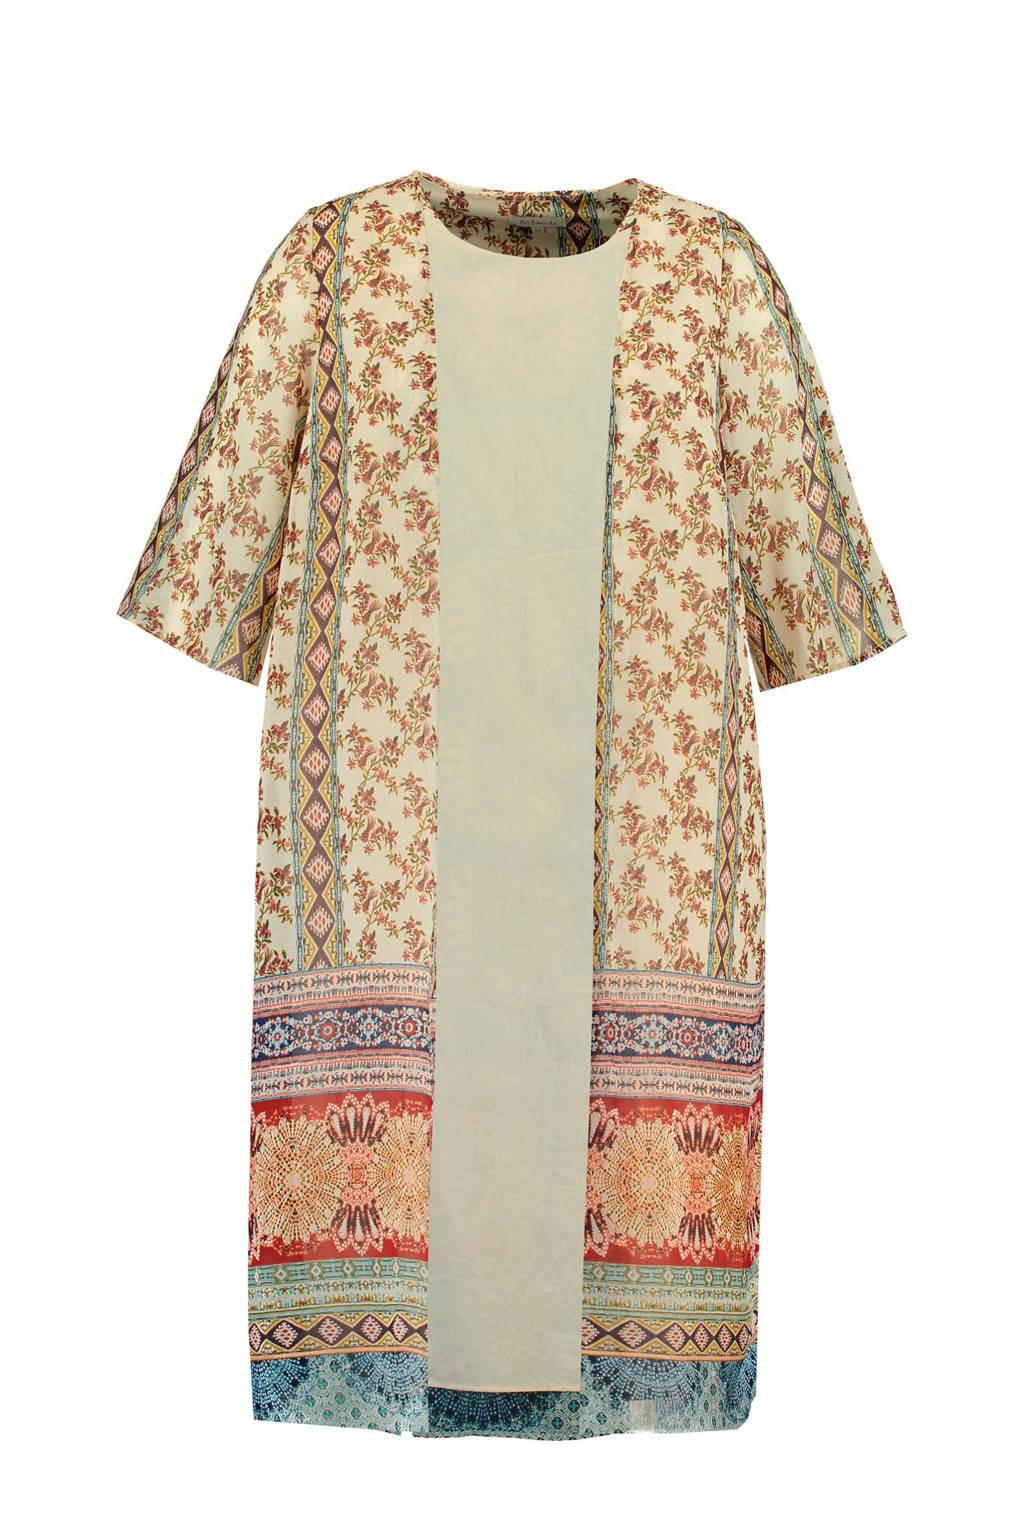 MS Mode kimono met all over print ecru multi, Ecru multi